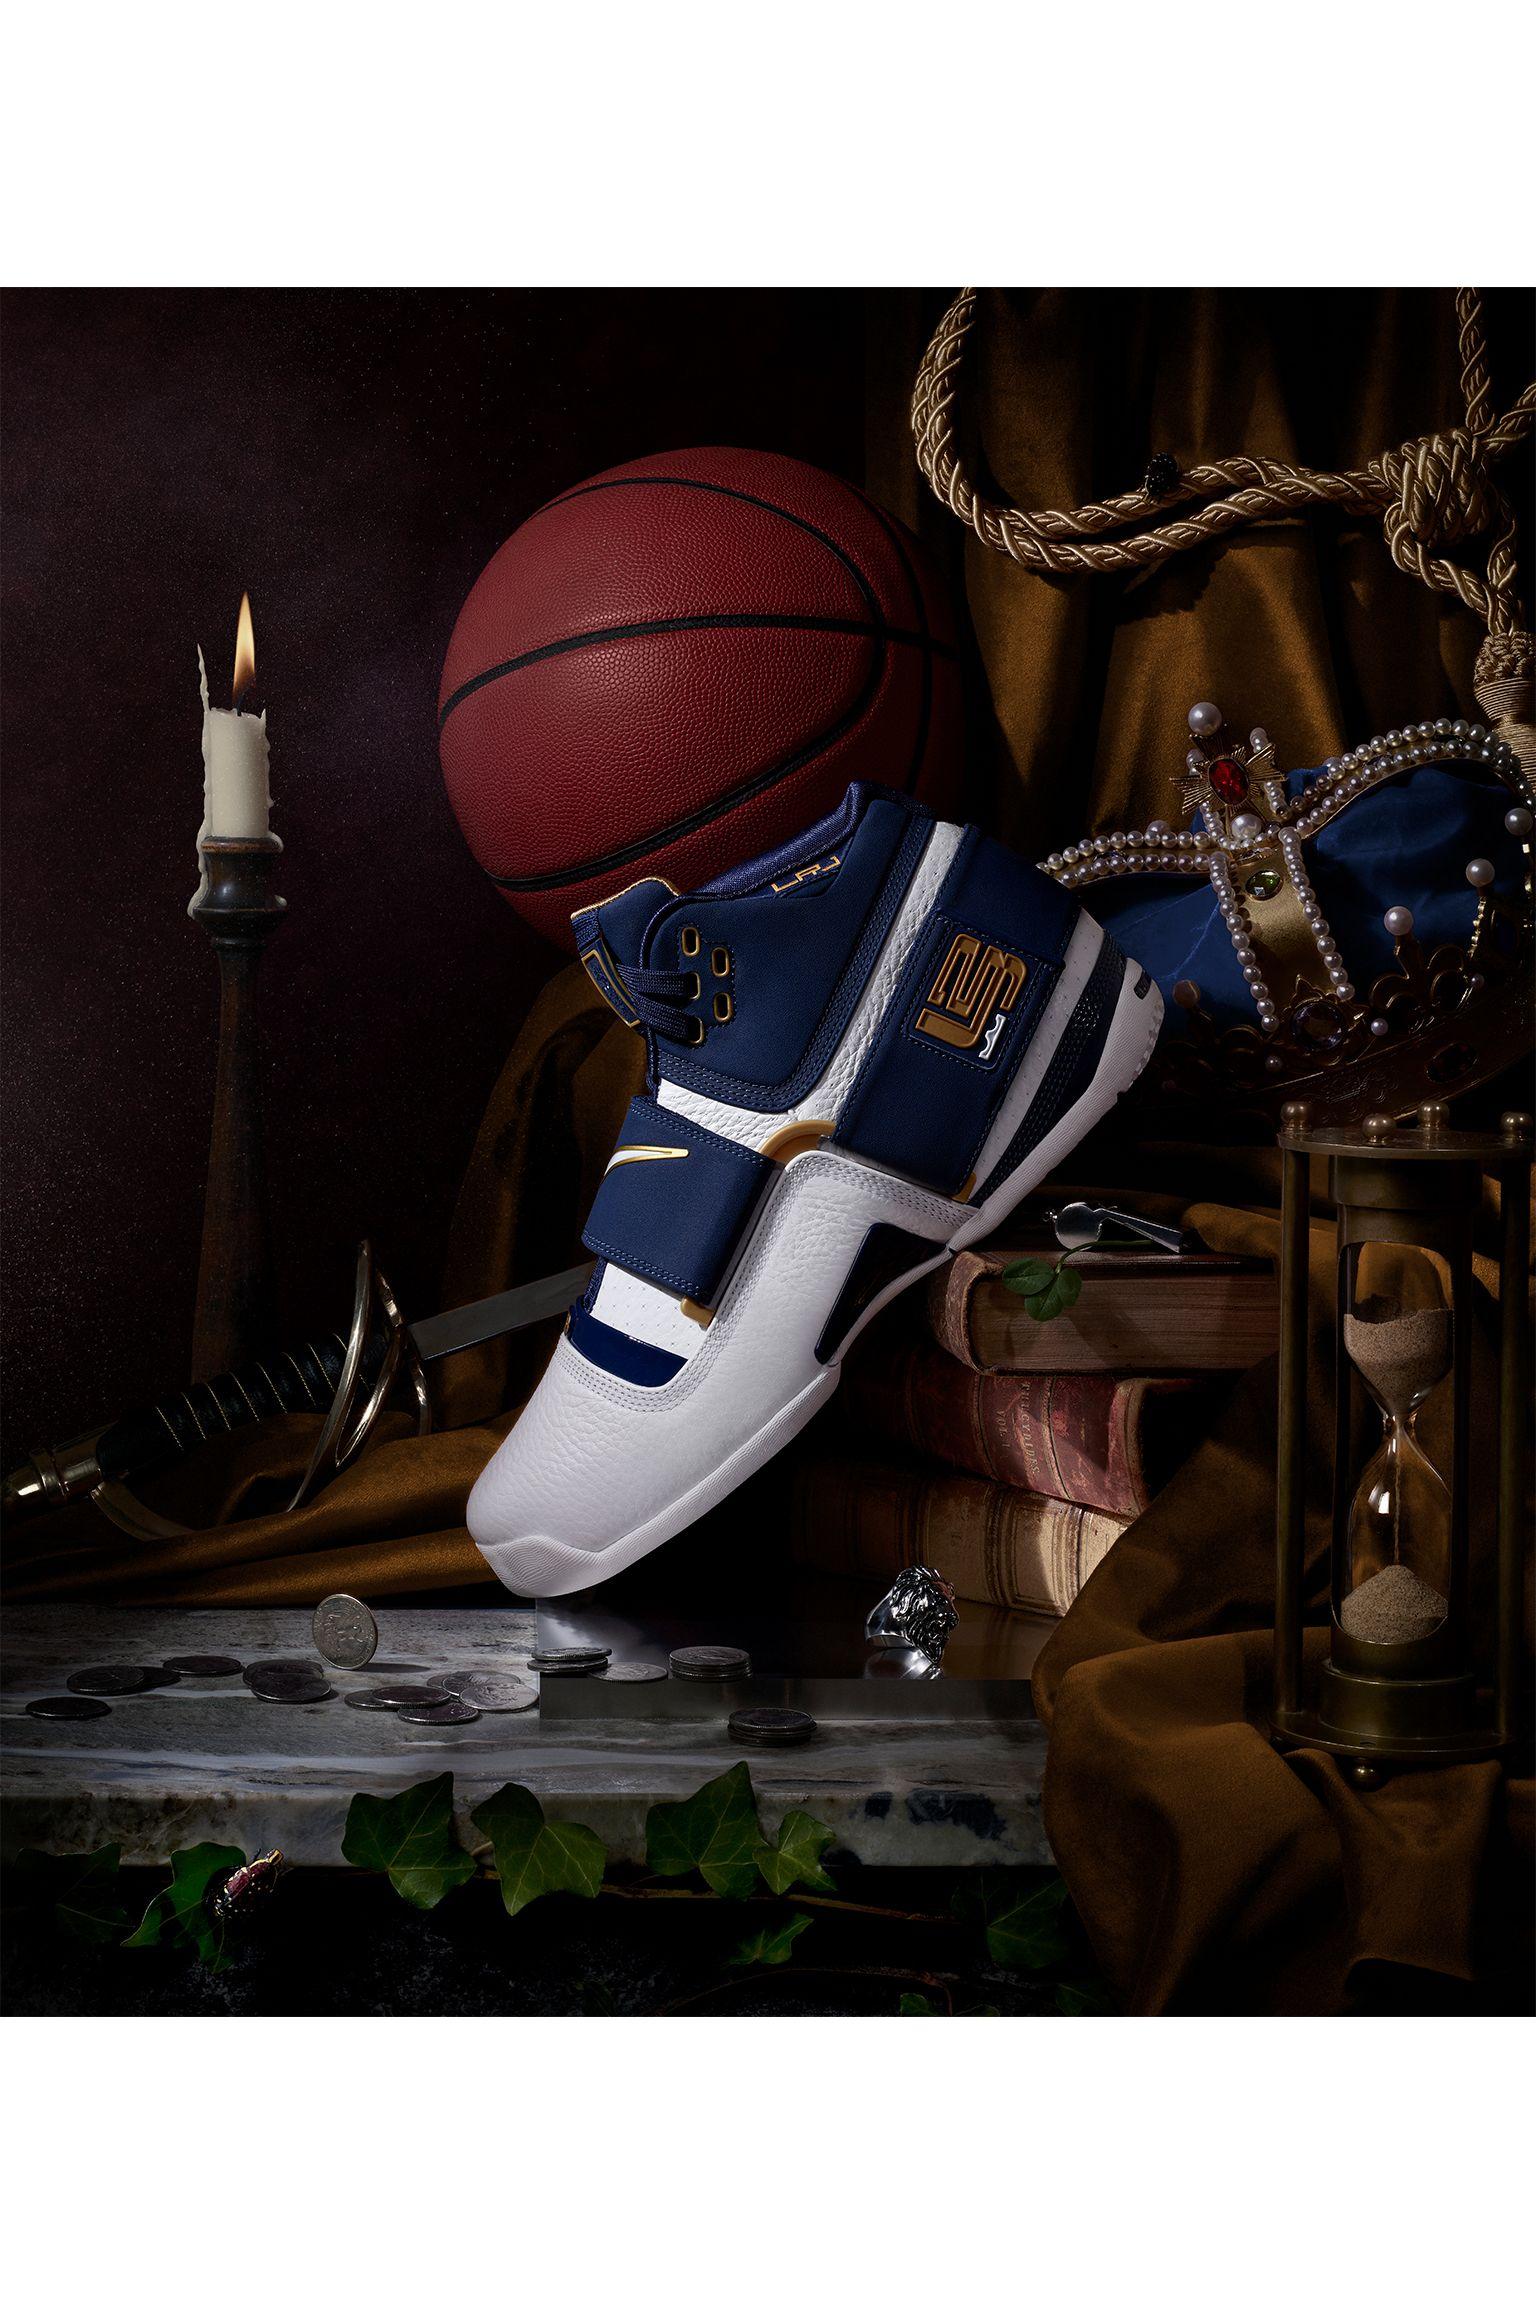 Art Of SNKRS: Nike Basketball CT16 Collection